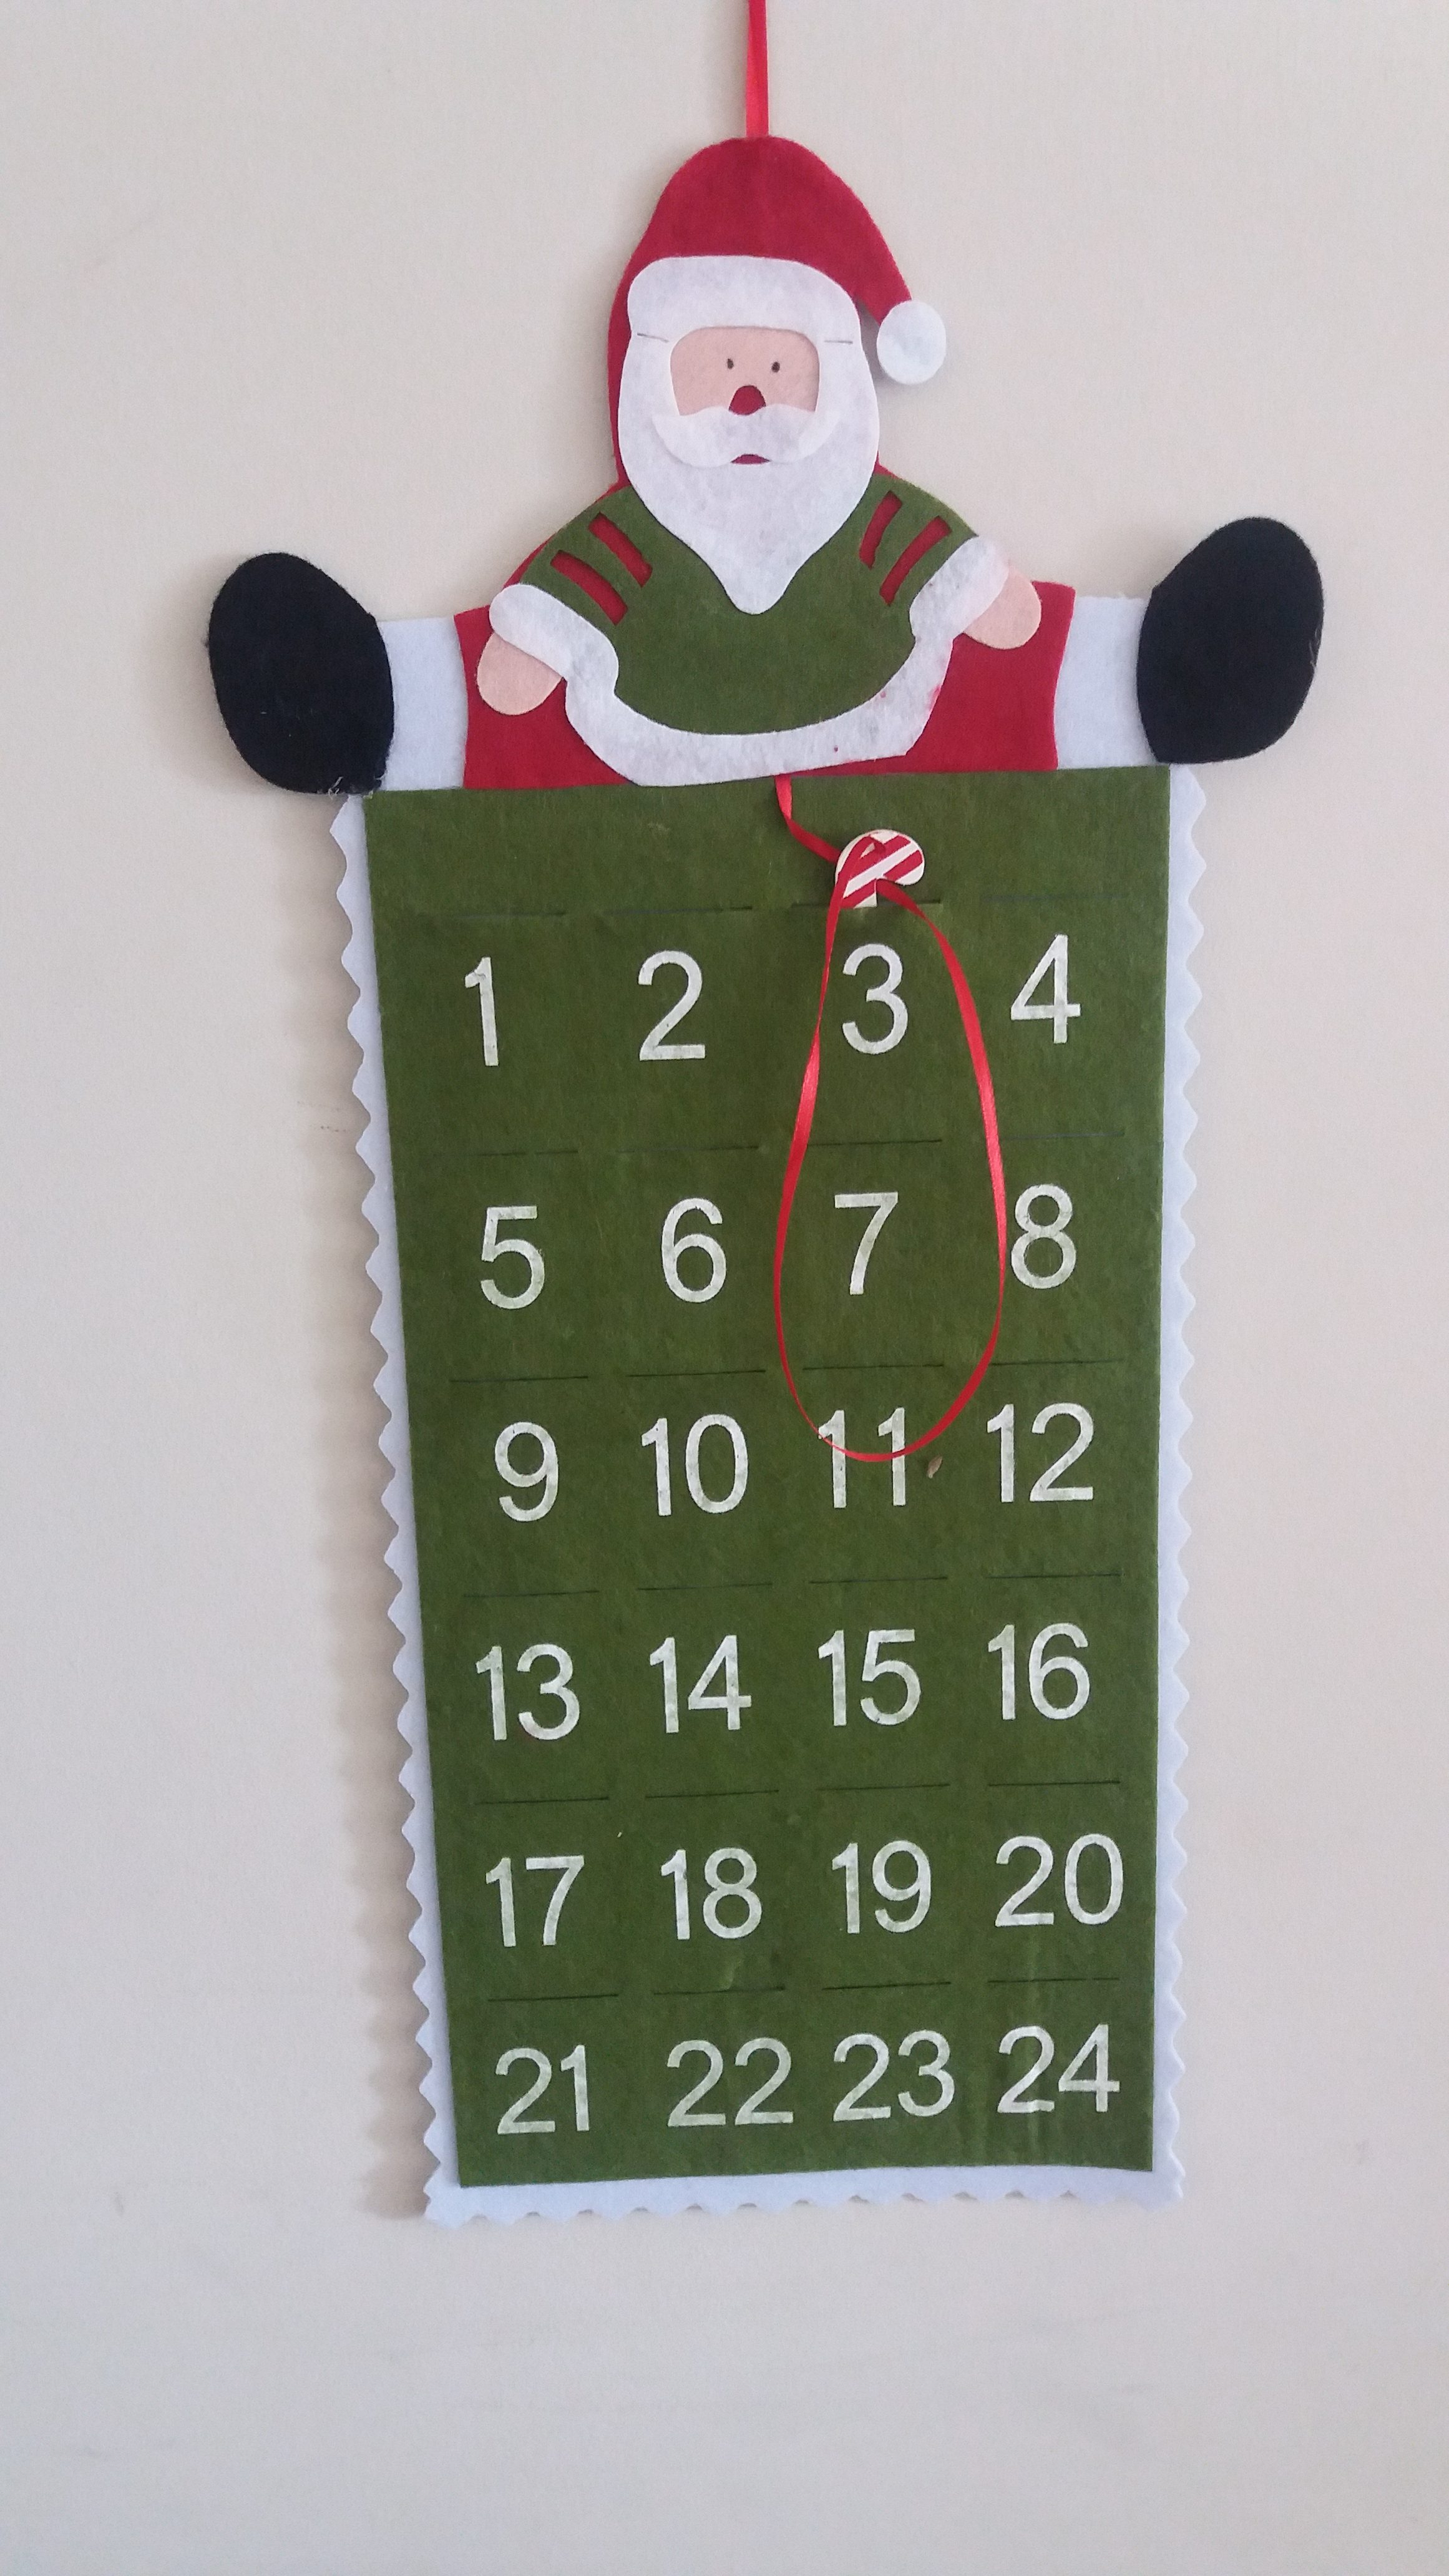 Calendario Para Kinder.Ideas Para Calendario De Adviento Para Ninos Con